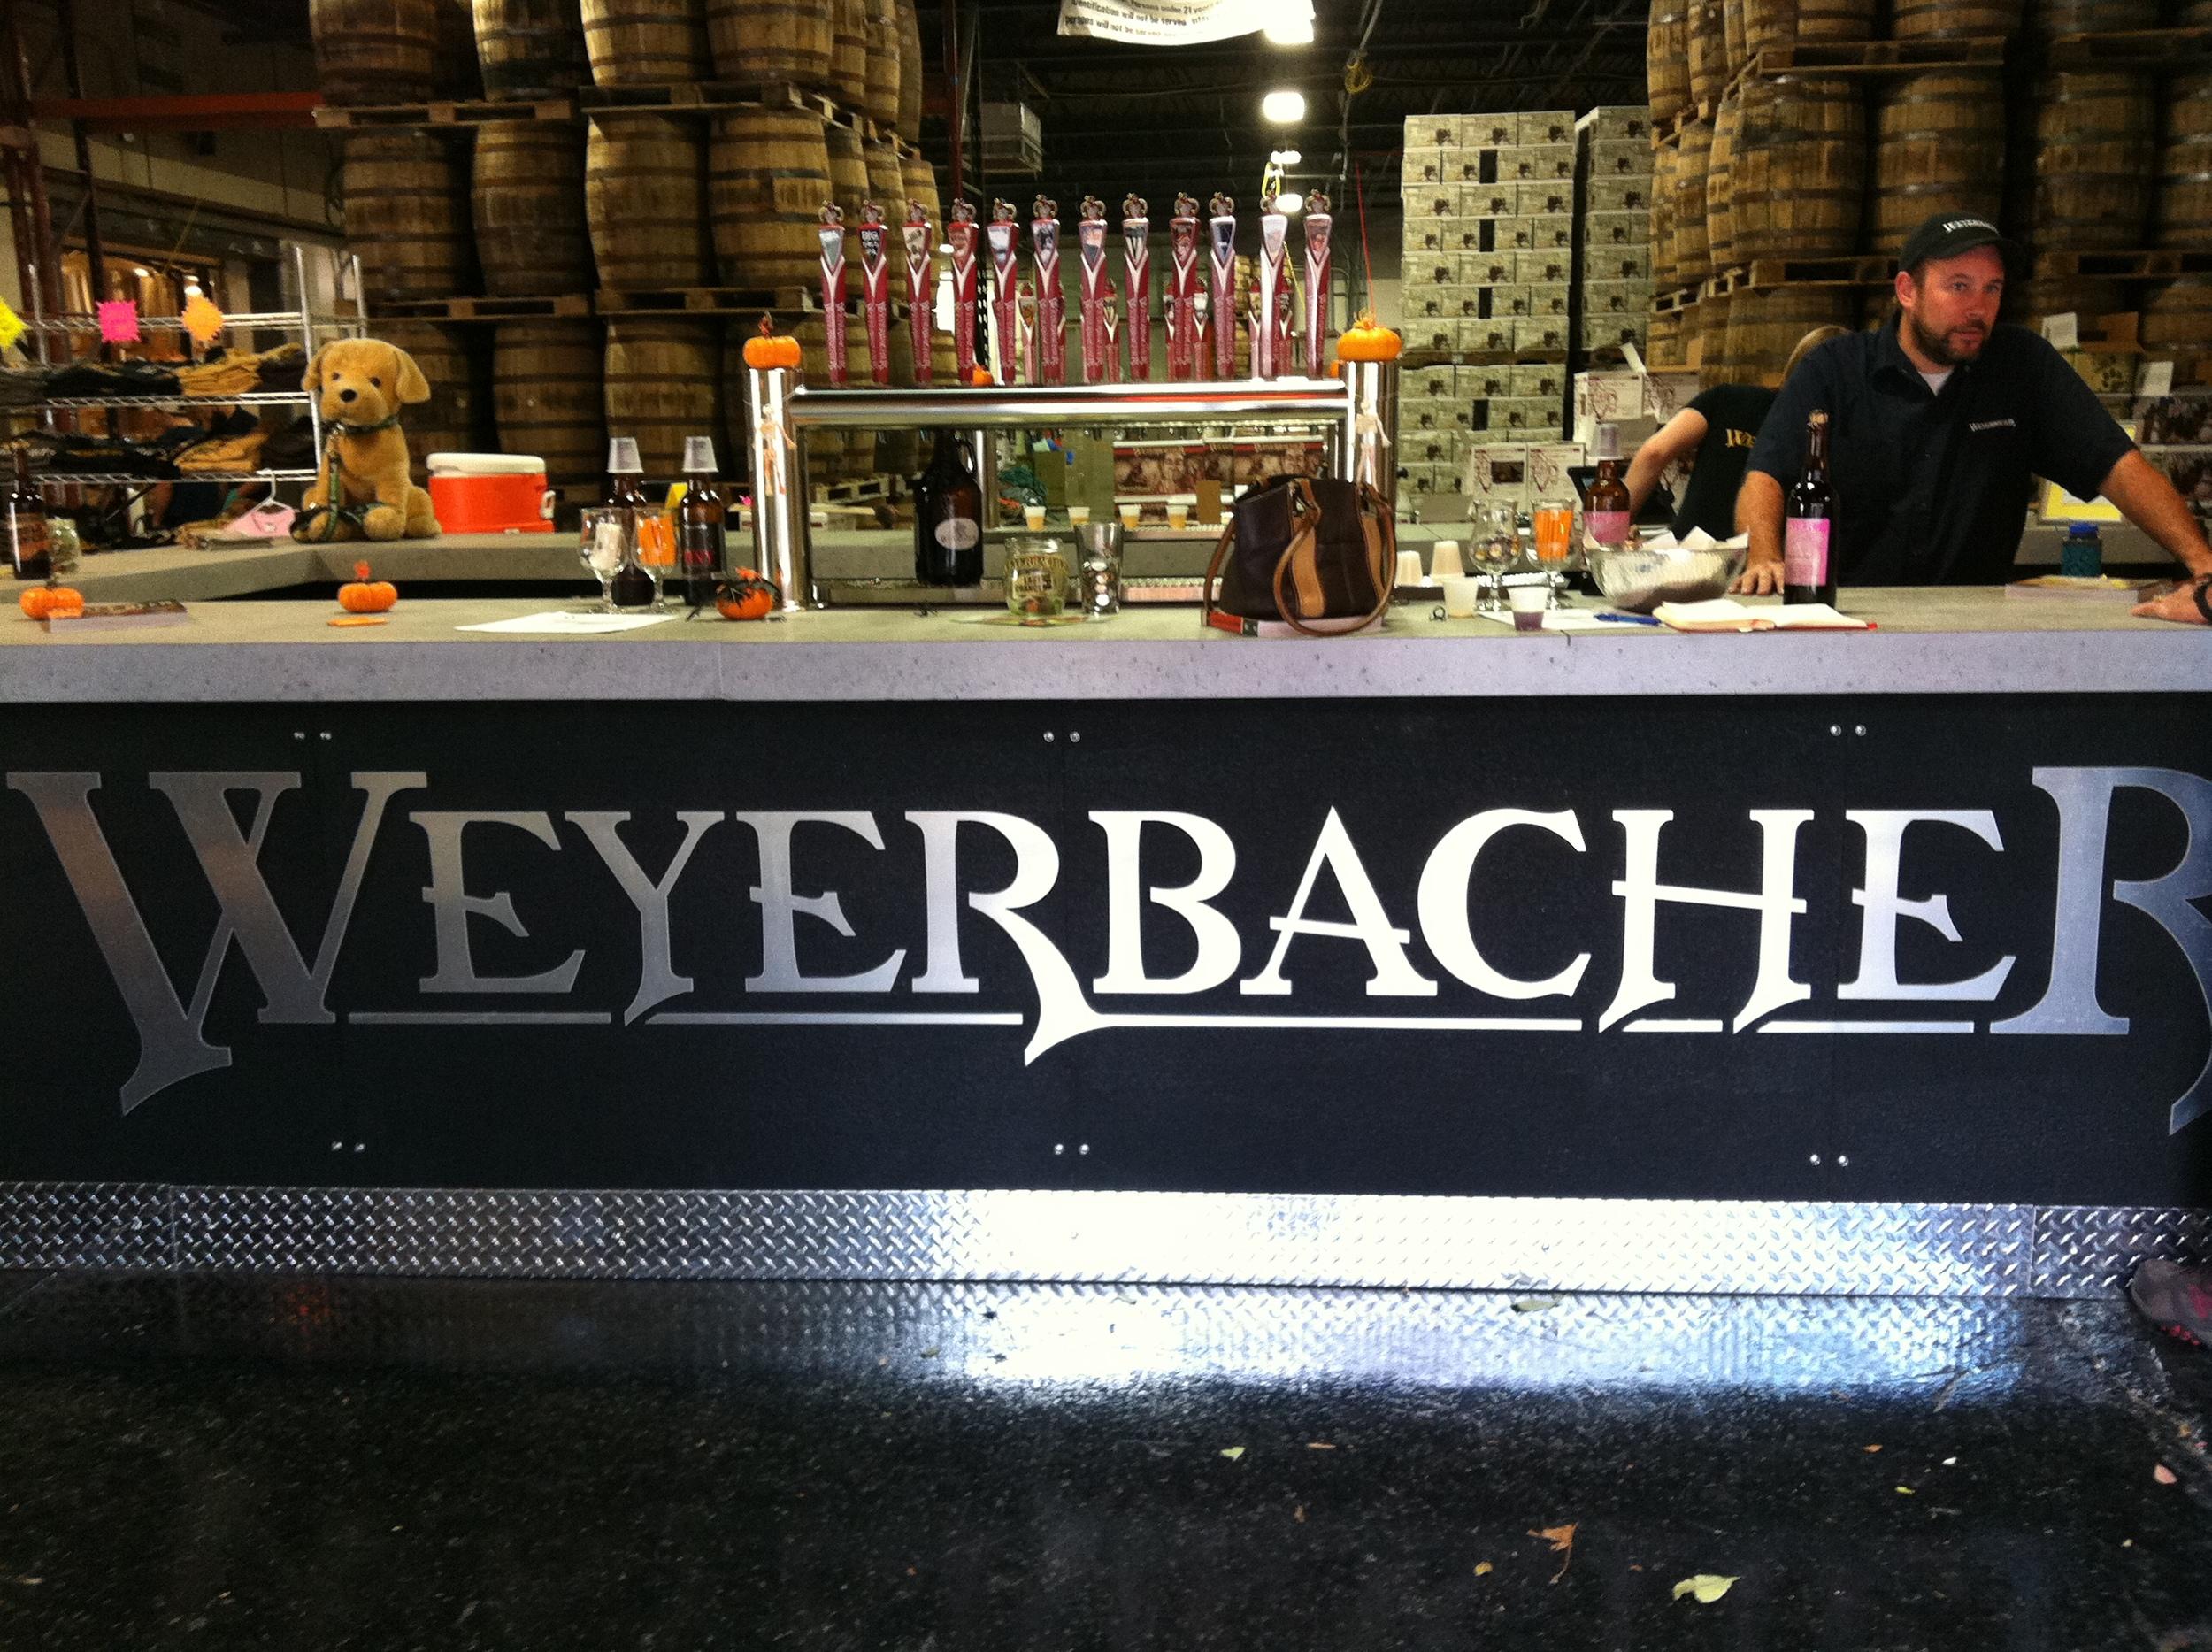 Bill Bragg, beer baronof the Weyerbacher Visitors' Center.